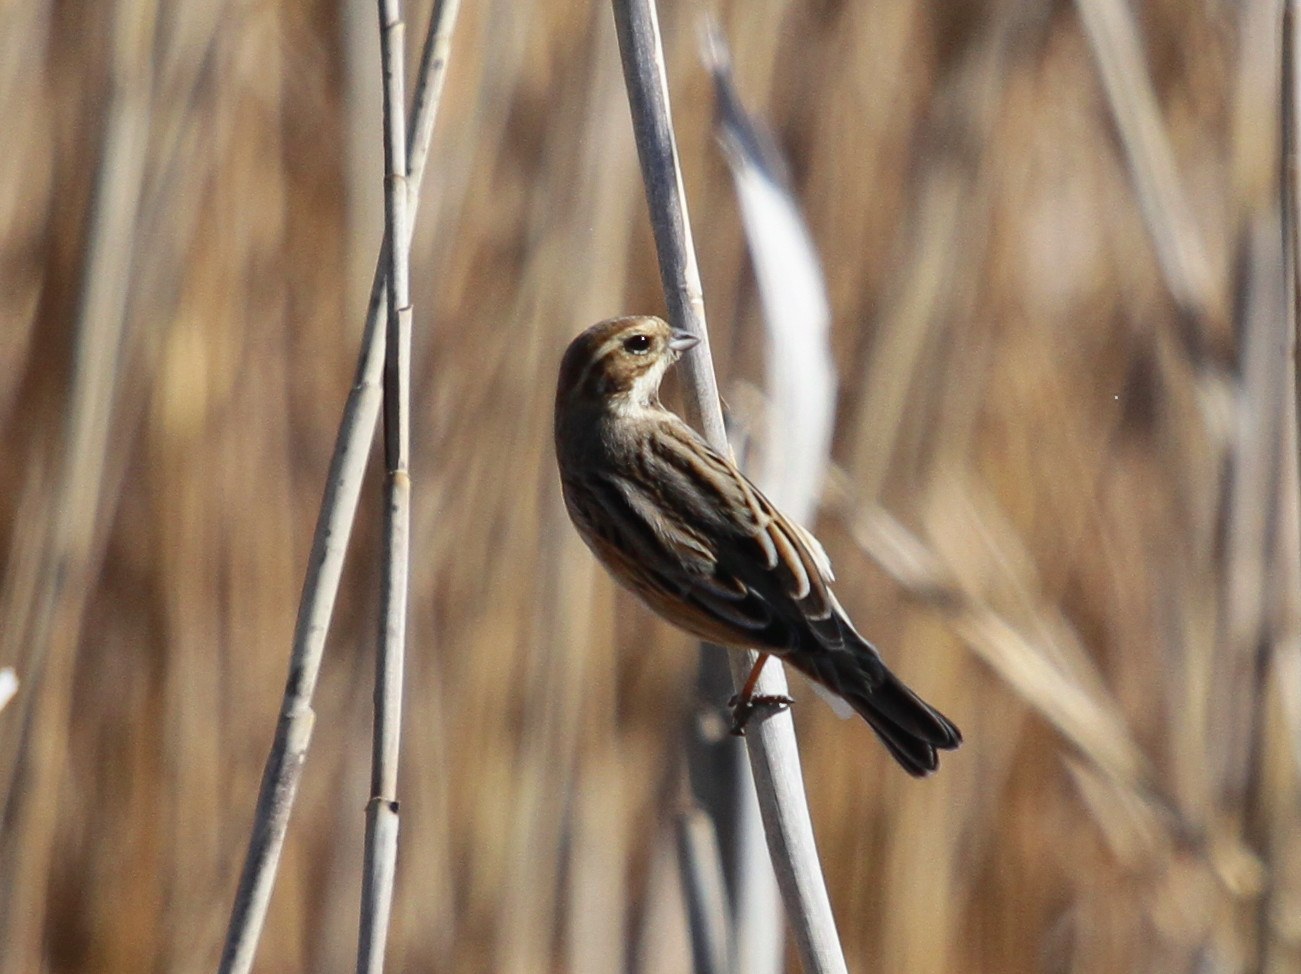 MFを鳥撮り散歩_f0239515_21275856.jpg